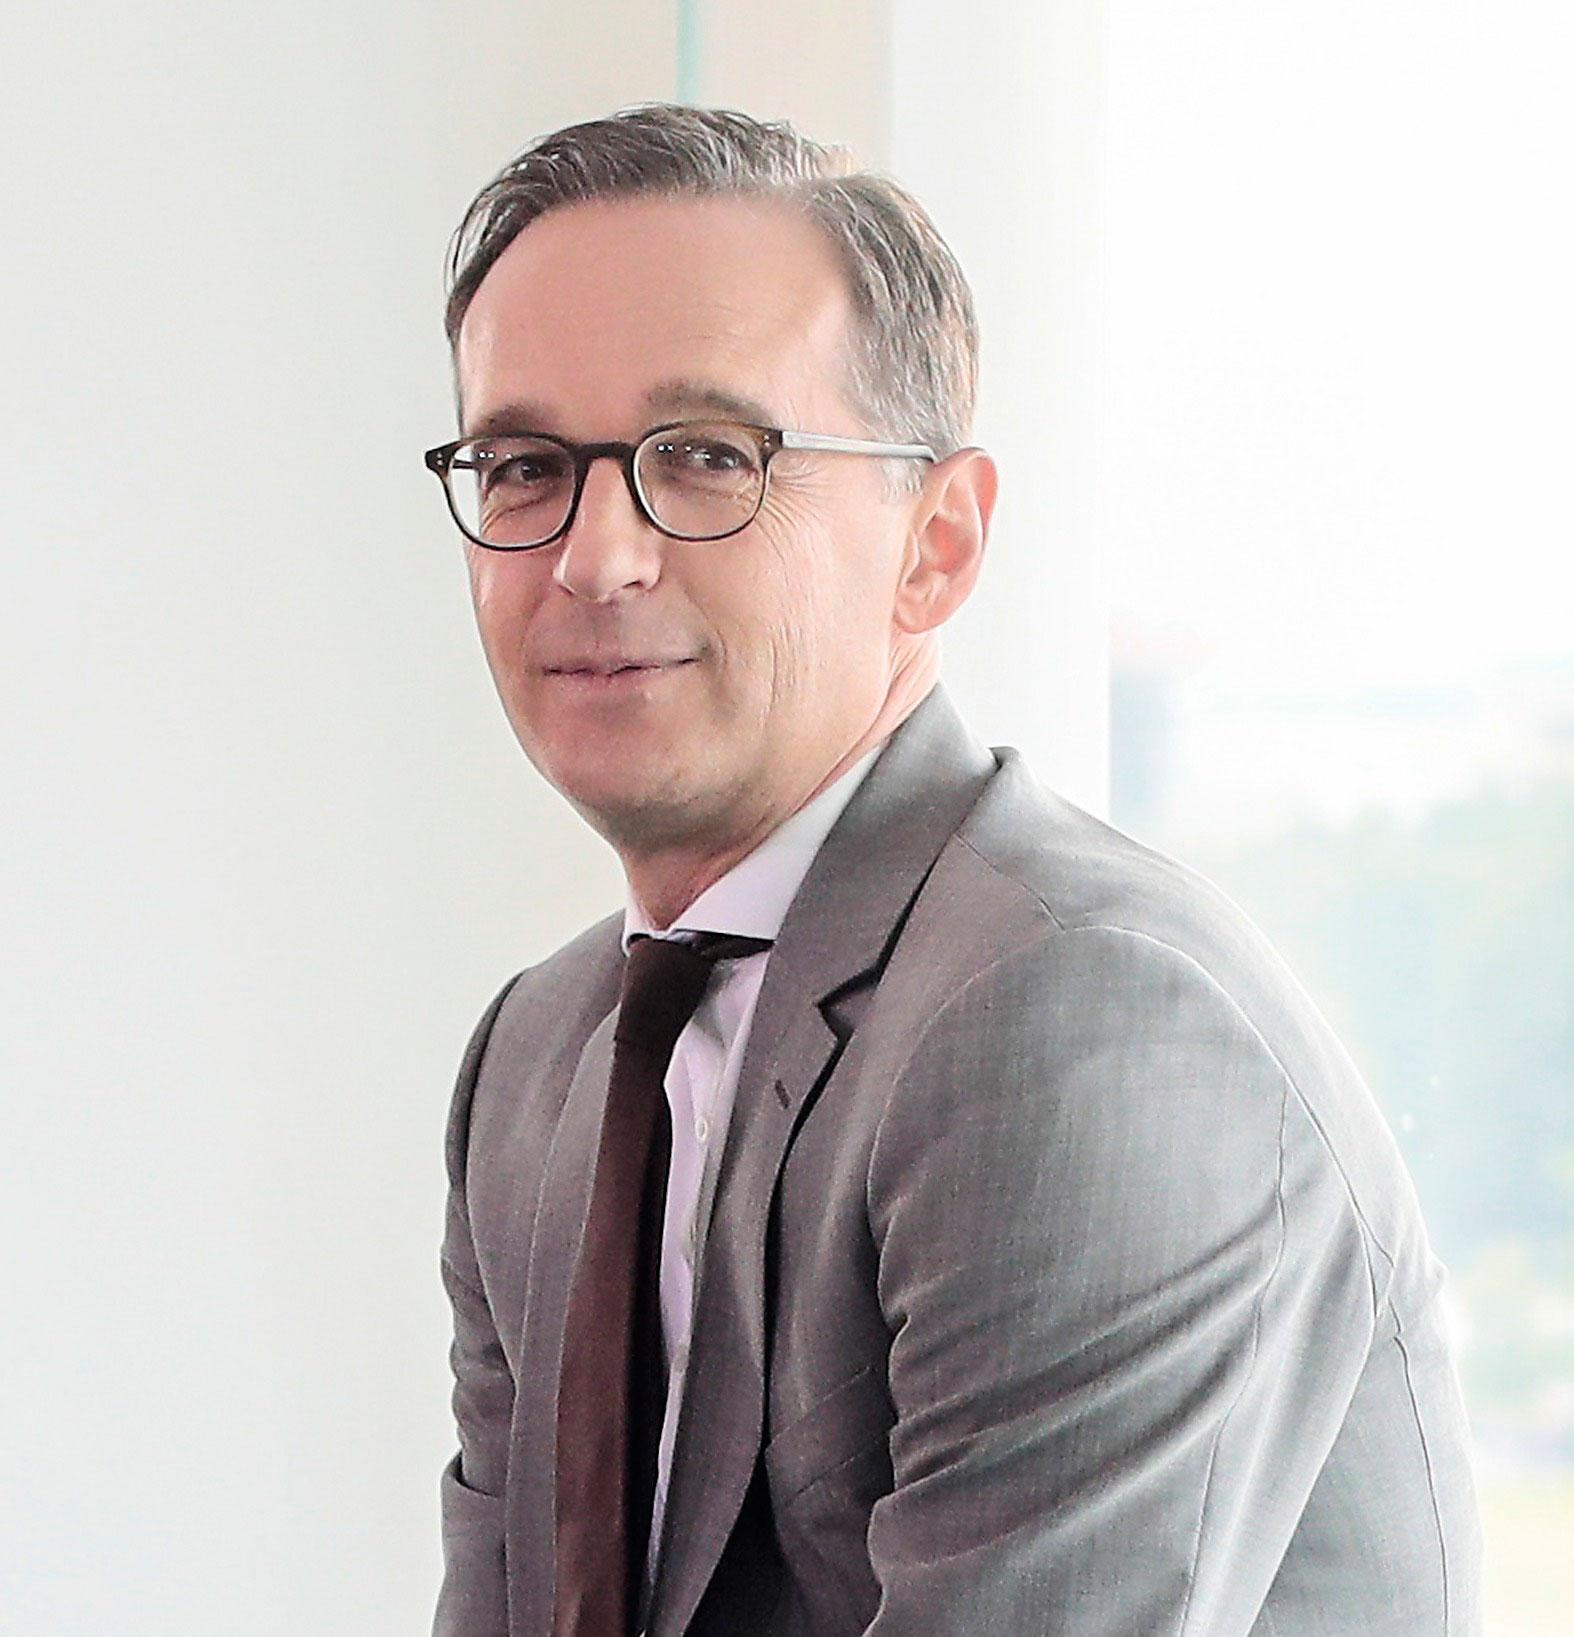 Heiko Maas, Tysklands justitieminister.